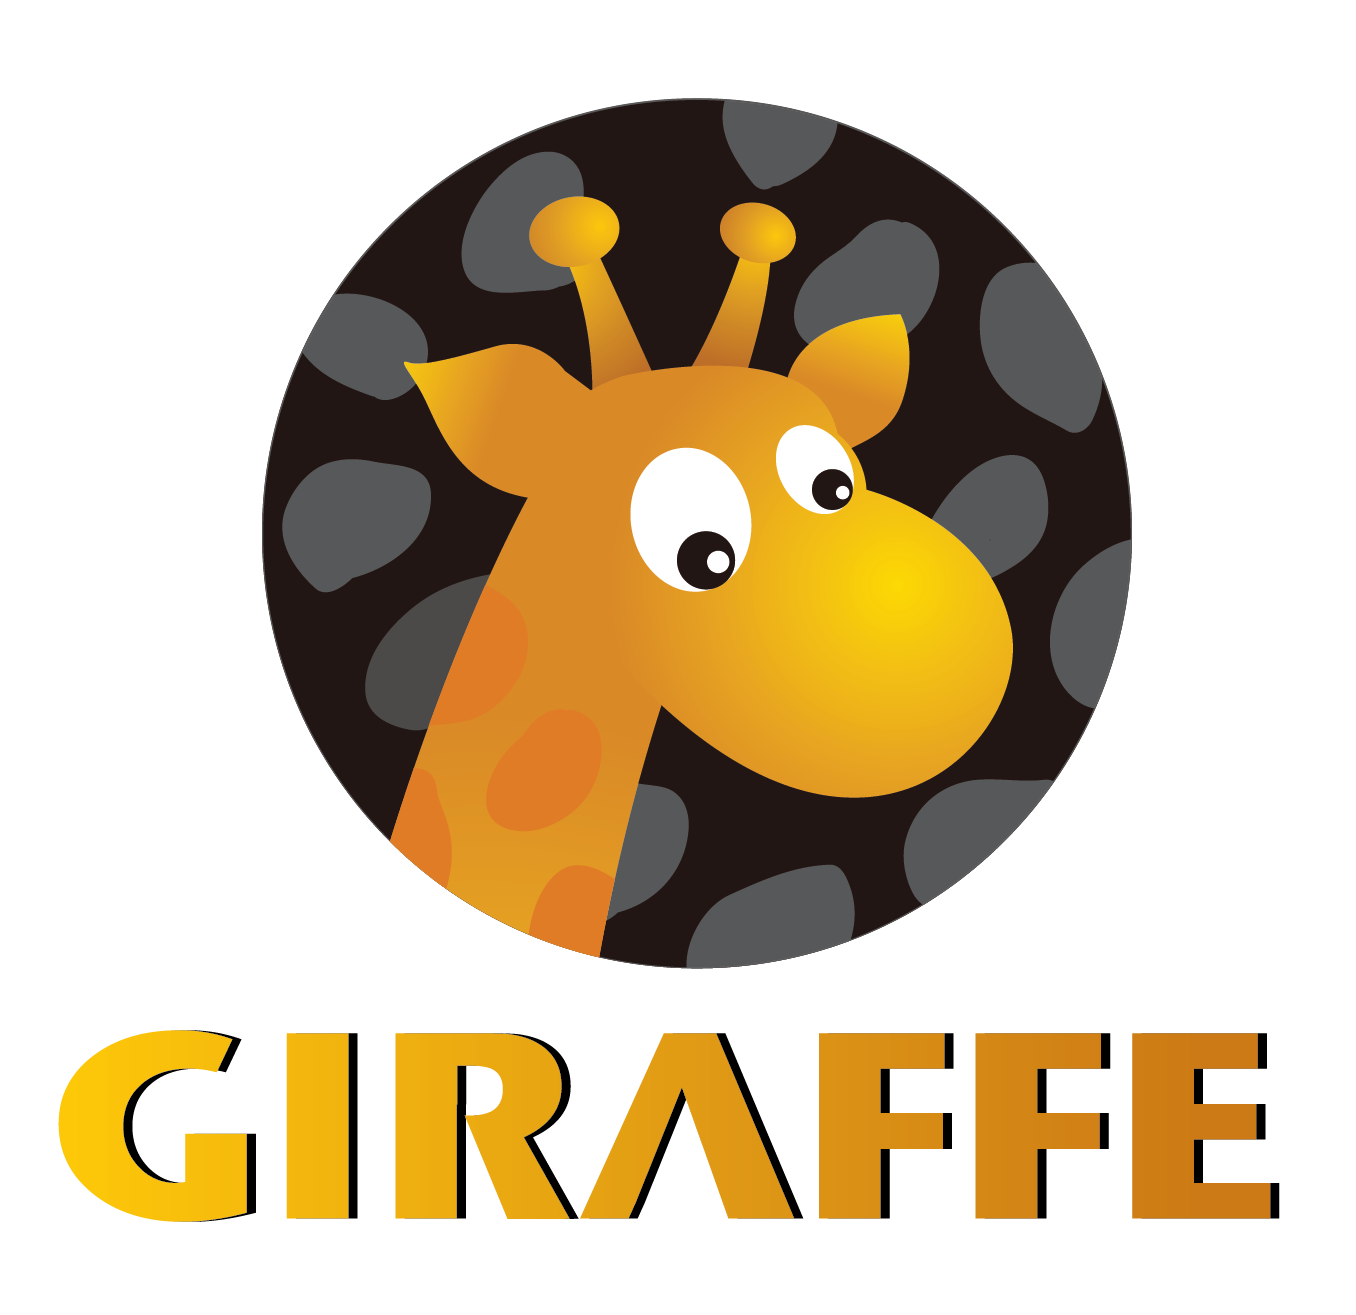 GIRAFFE LOGO 01 長頸鹿美語桃園管理處